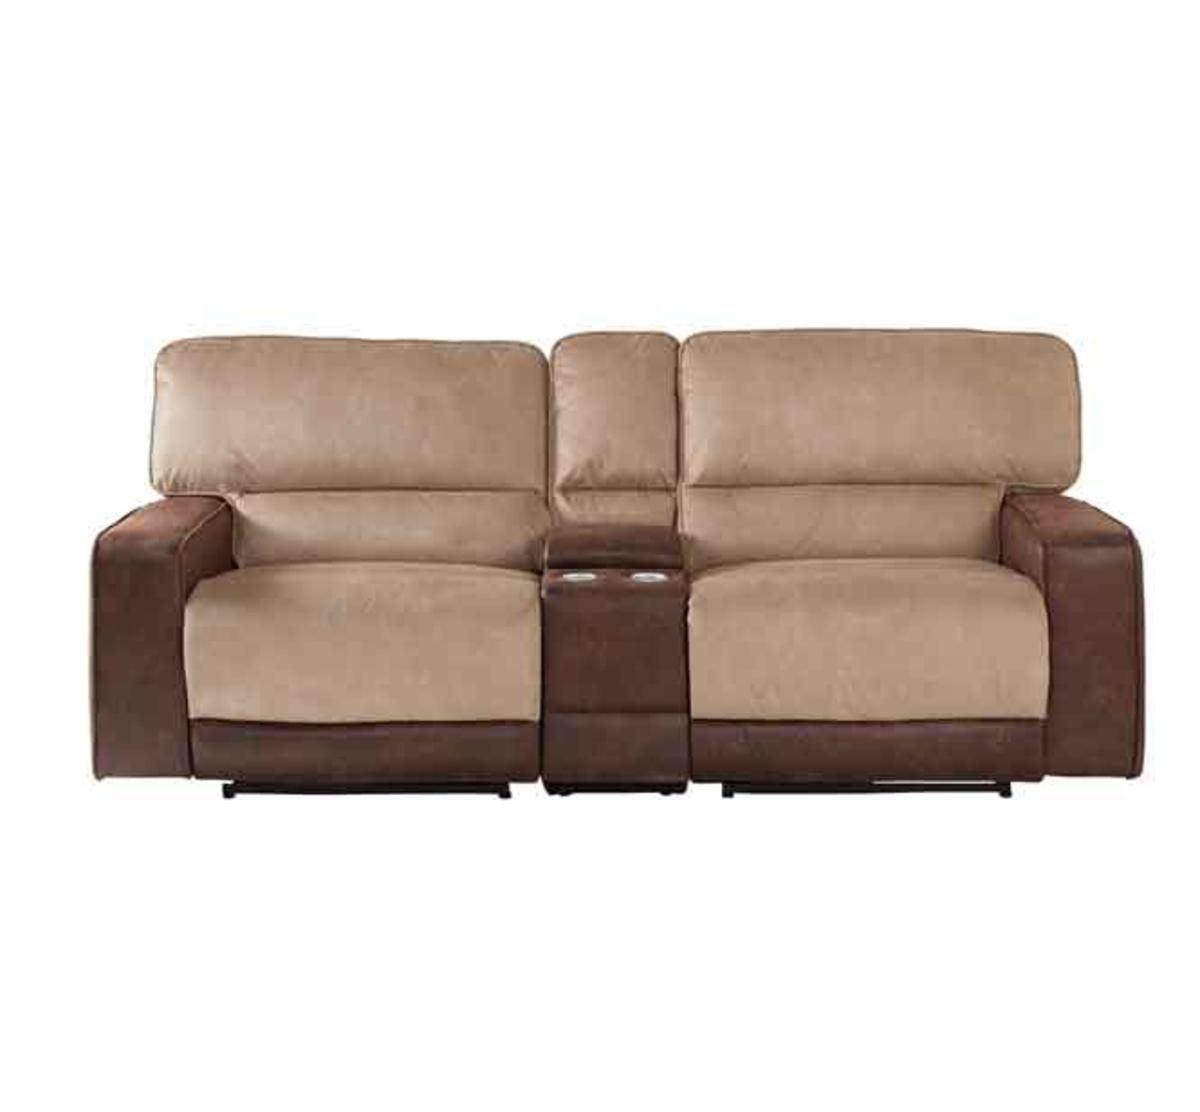 sofa theater pasadena minimalist modern duke sectional bed 3 pc console badcock andmore